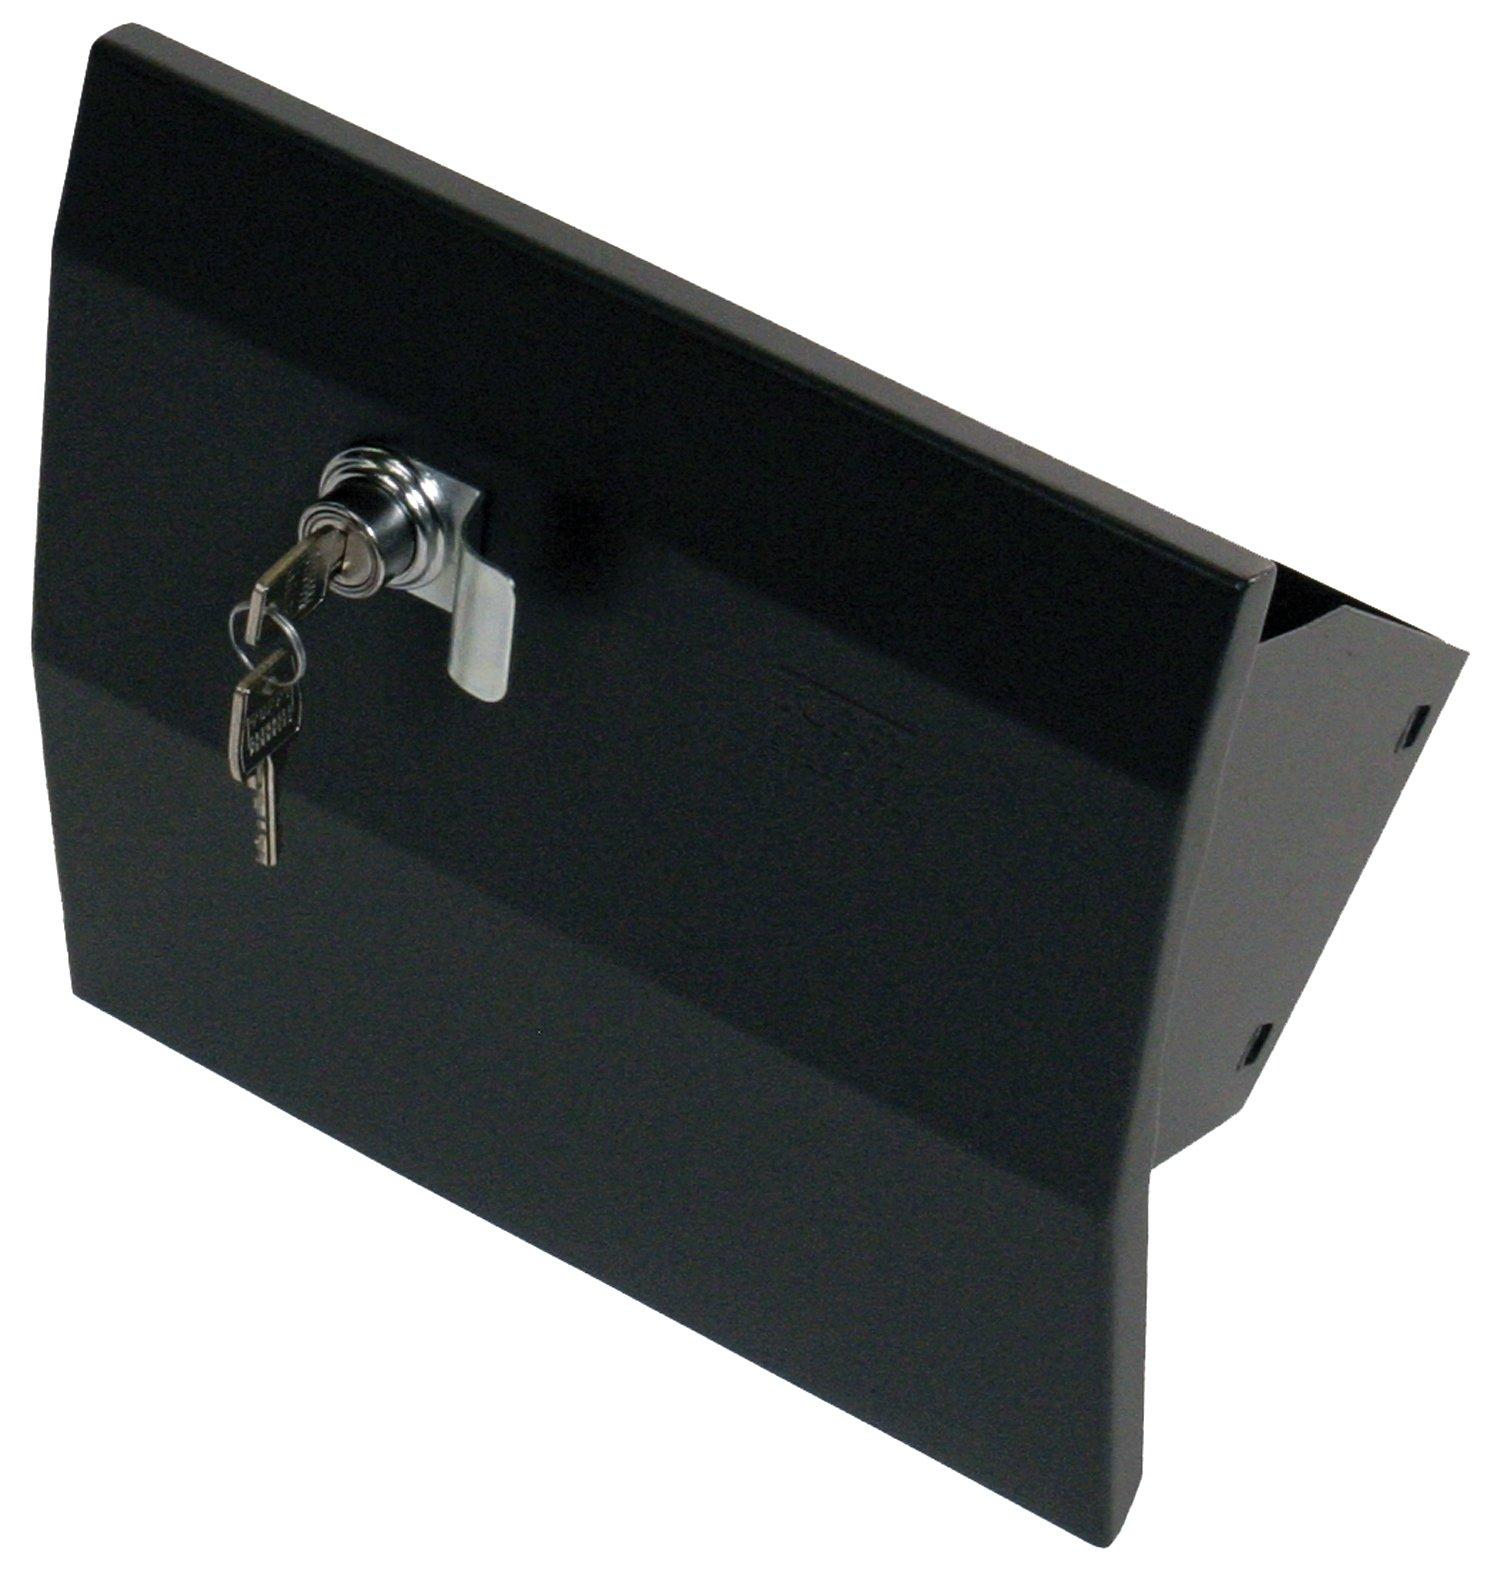 Tuffy 149-01 Glove Box-01-Black 5/8W X 8 7/16D X 11 1/8T for 2007+ Jk Wrangler